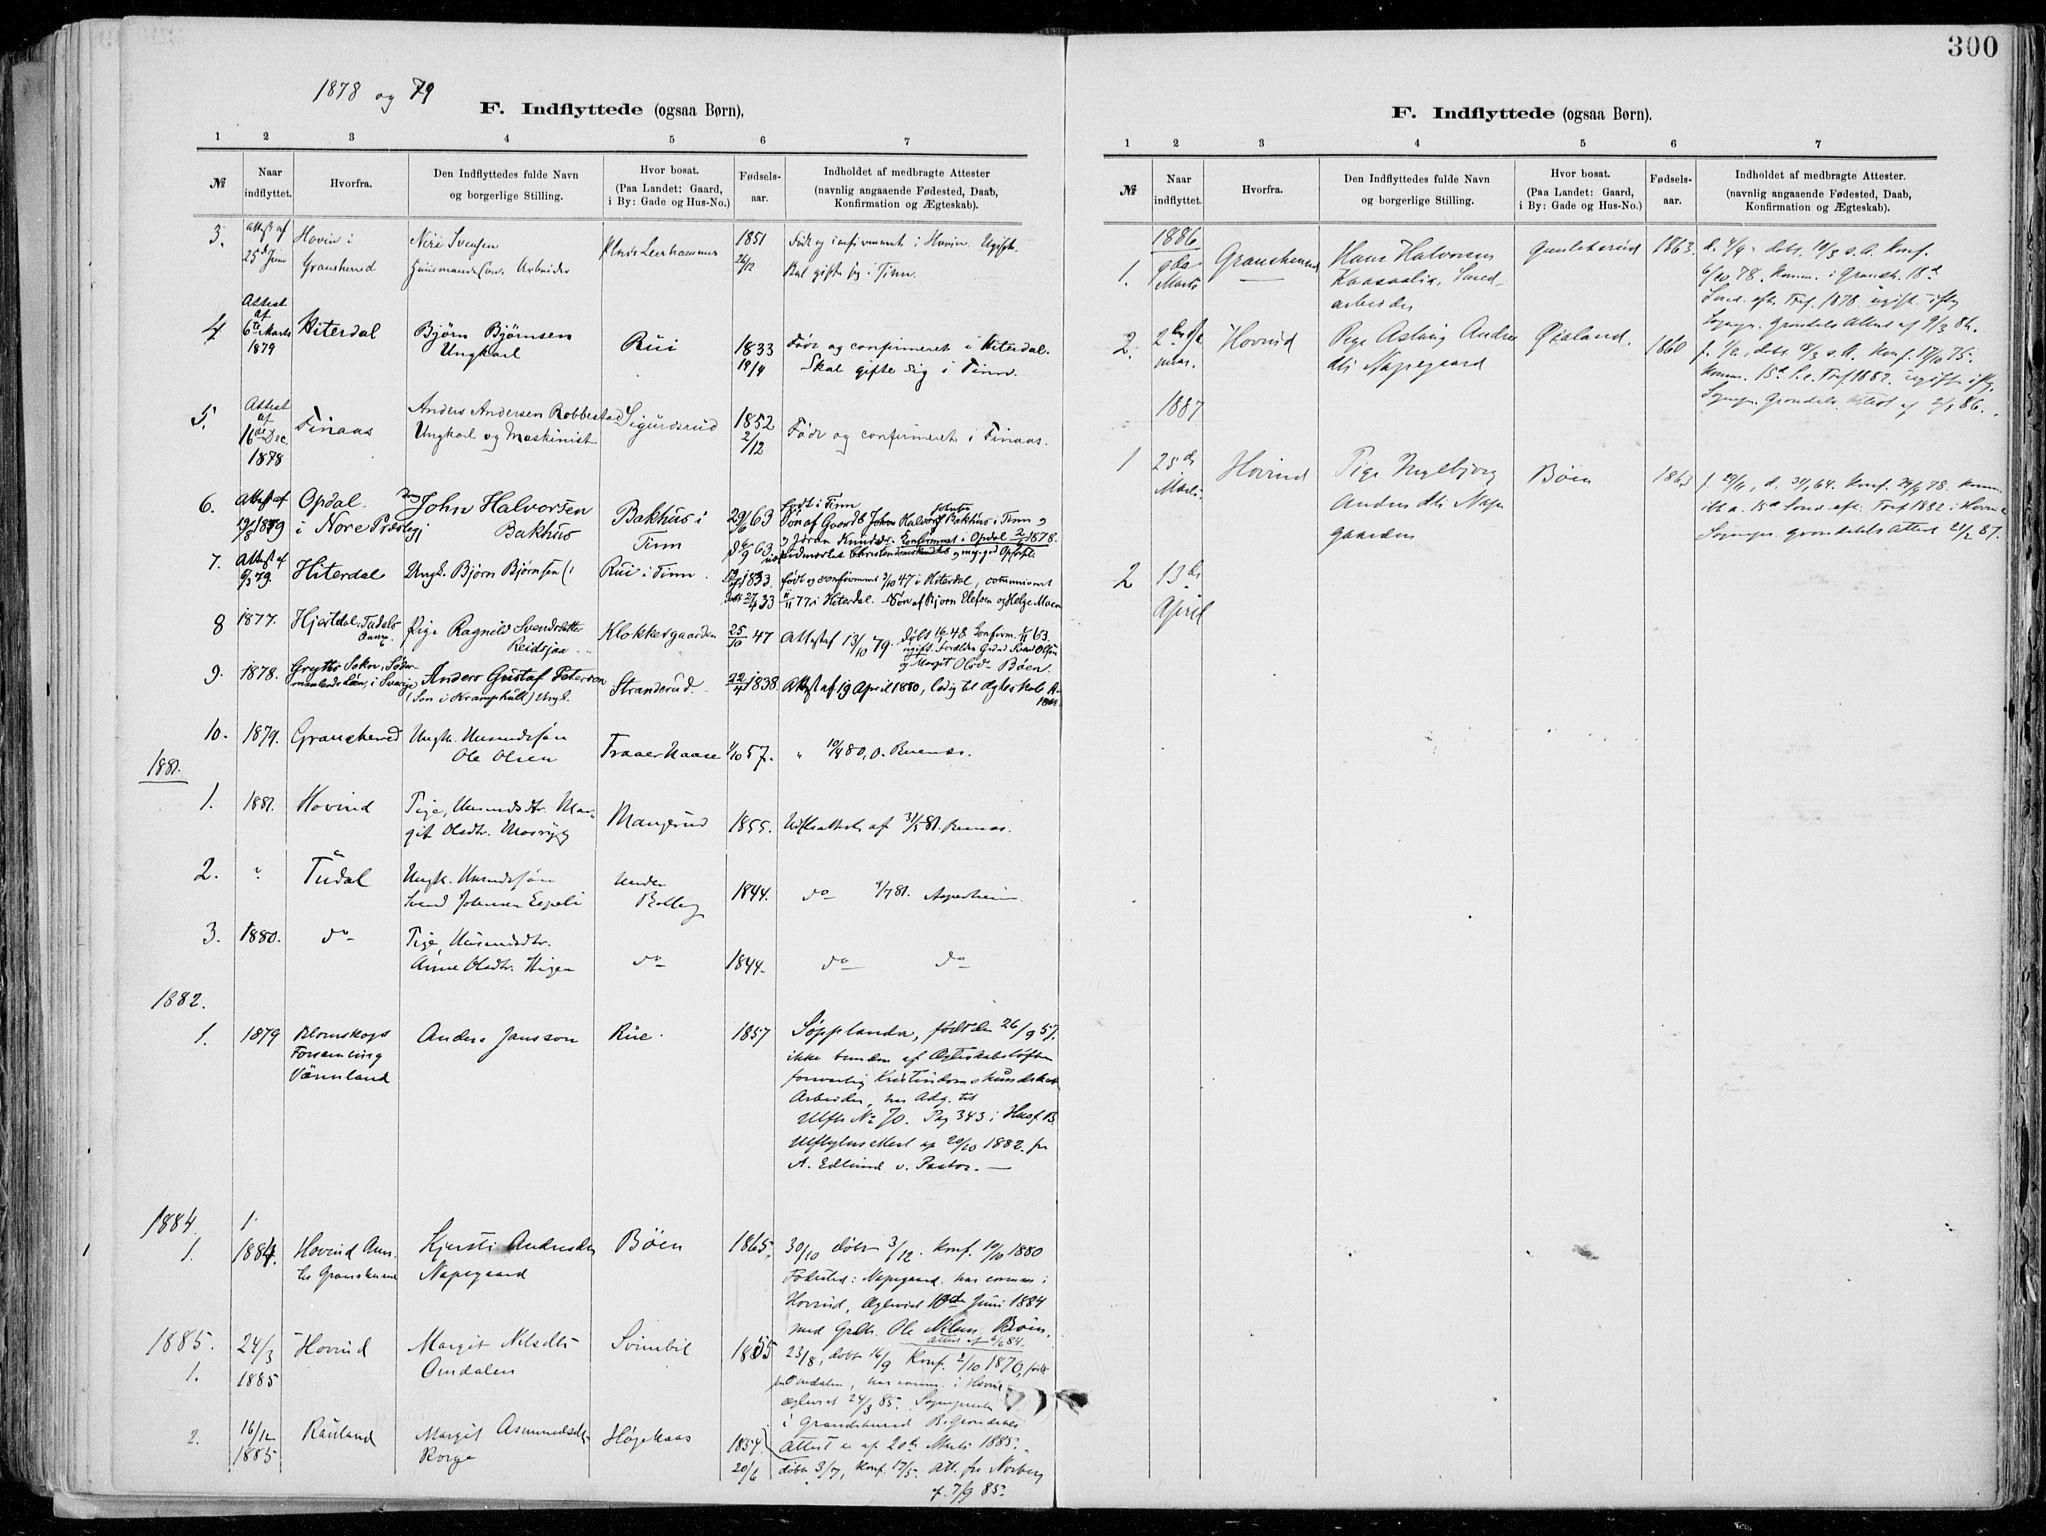 SAKO, Tinn kirkebøker, F/Fa/L0007: Ministerialbok nr. I 7, 1878-1922, s. 300